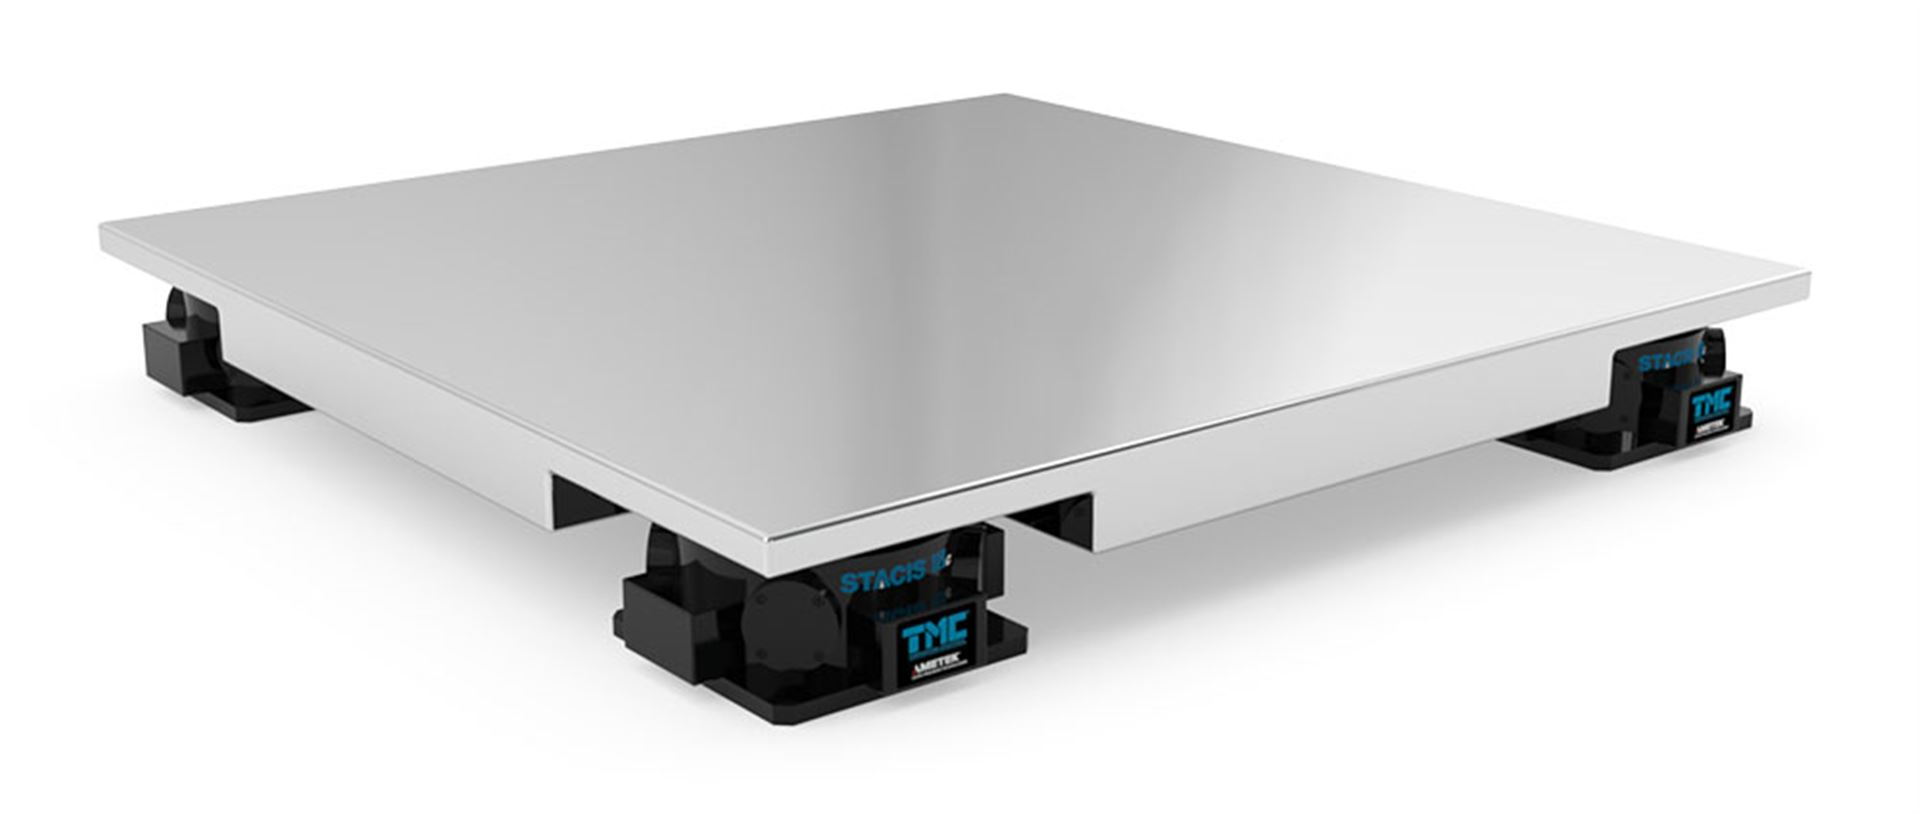 Neues TMC Produkt: STACIS Compact Quiet Island